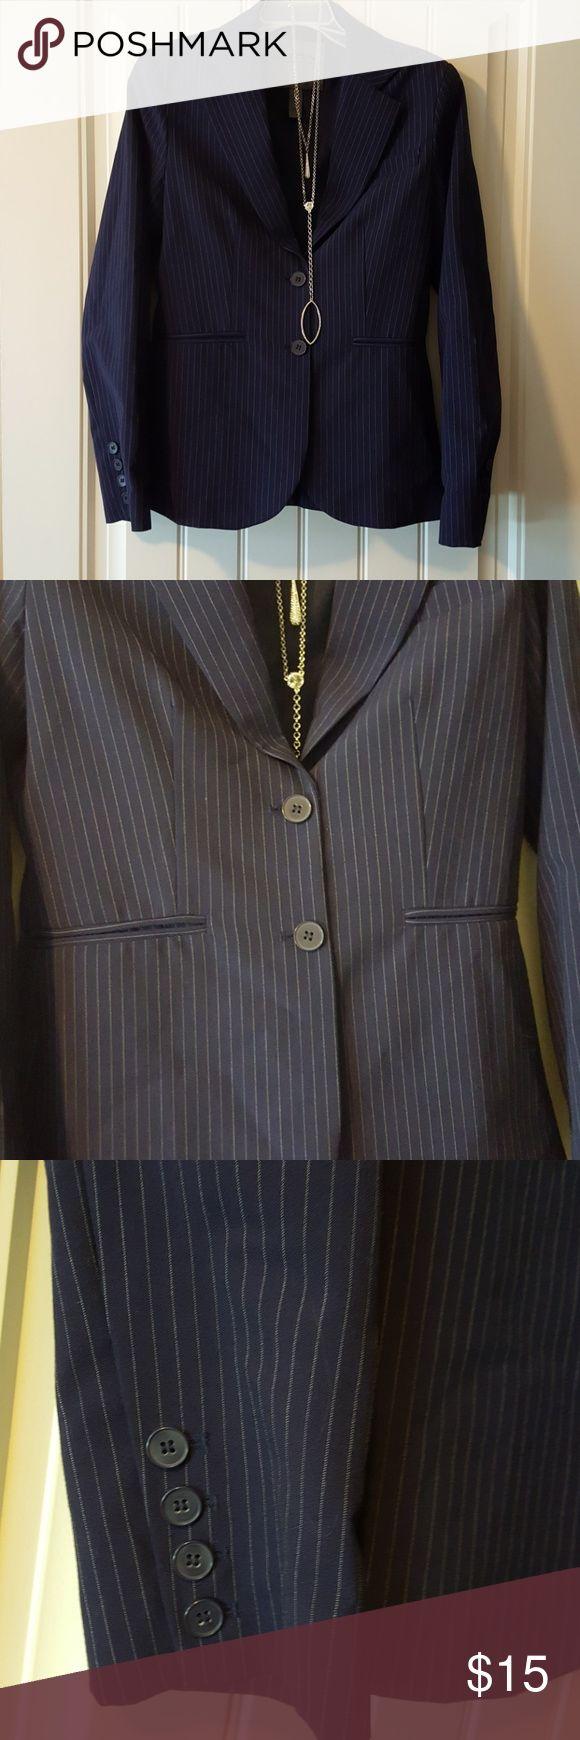 Sarah Jessica Parker suite jacket blazer Blue with small white pinstripes. Bitten by Sarah Jessica Parker Jackets & Coats Blazers